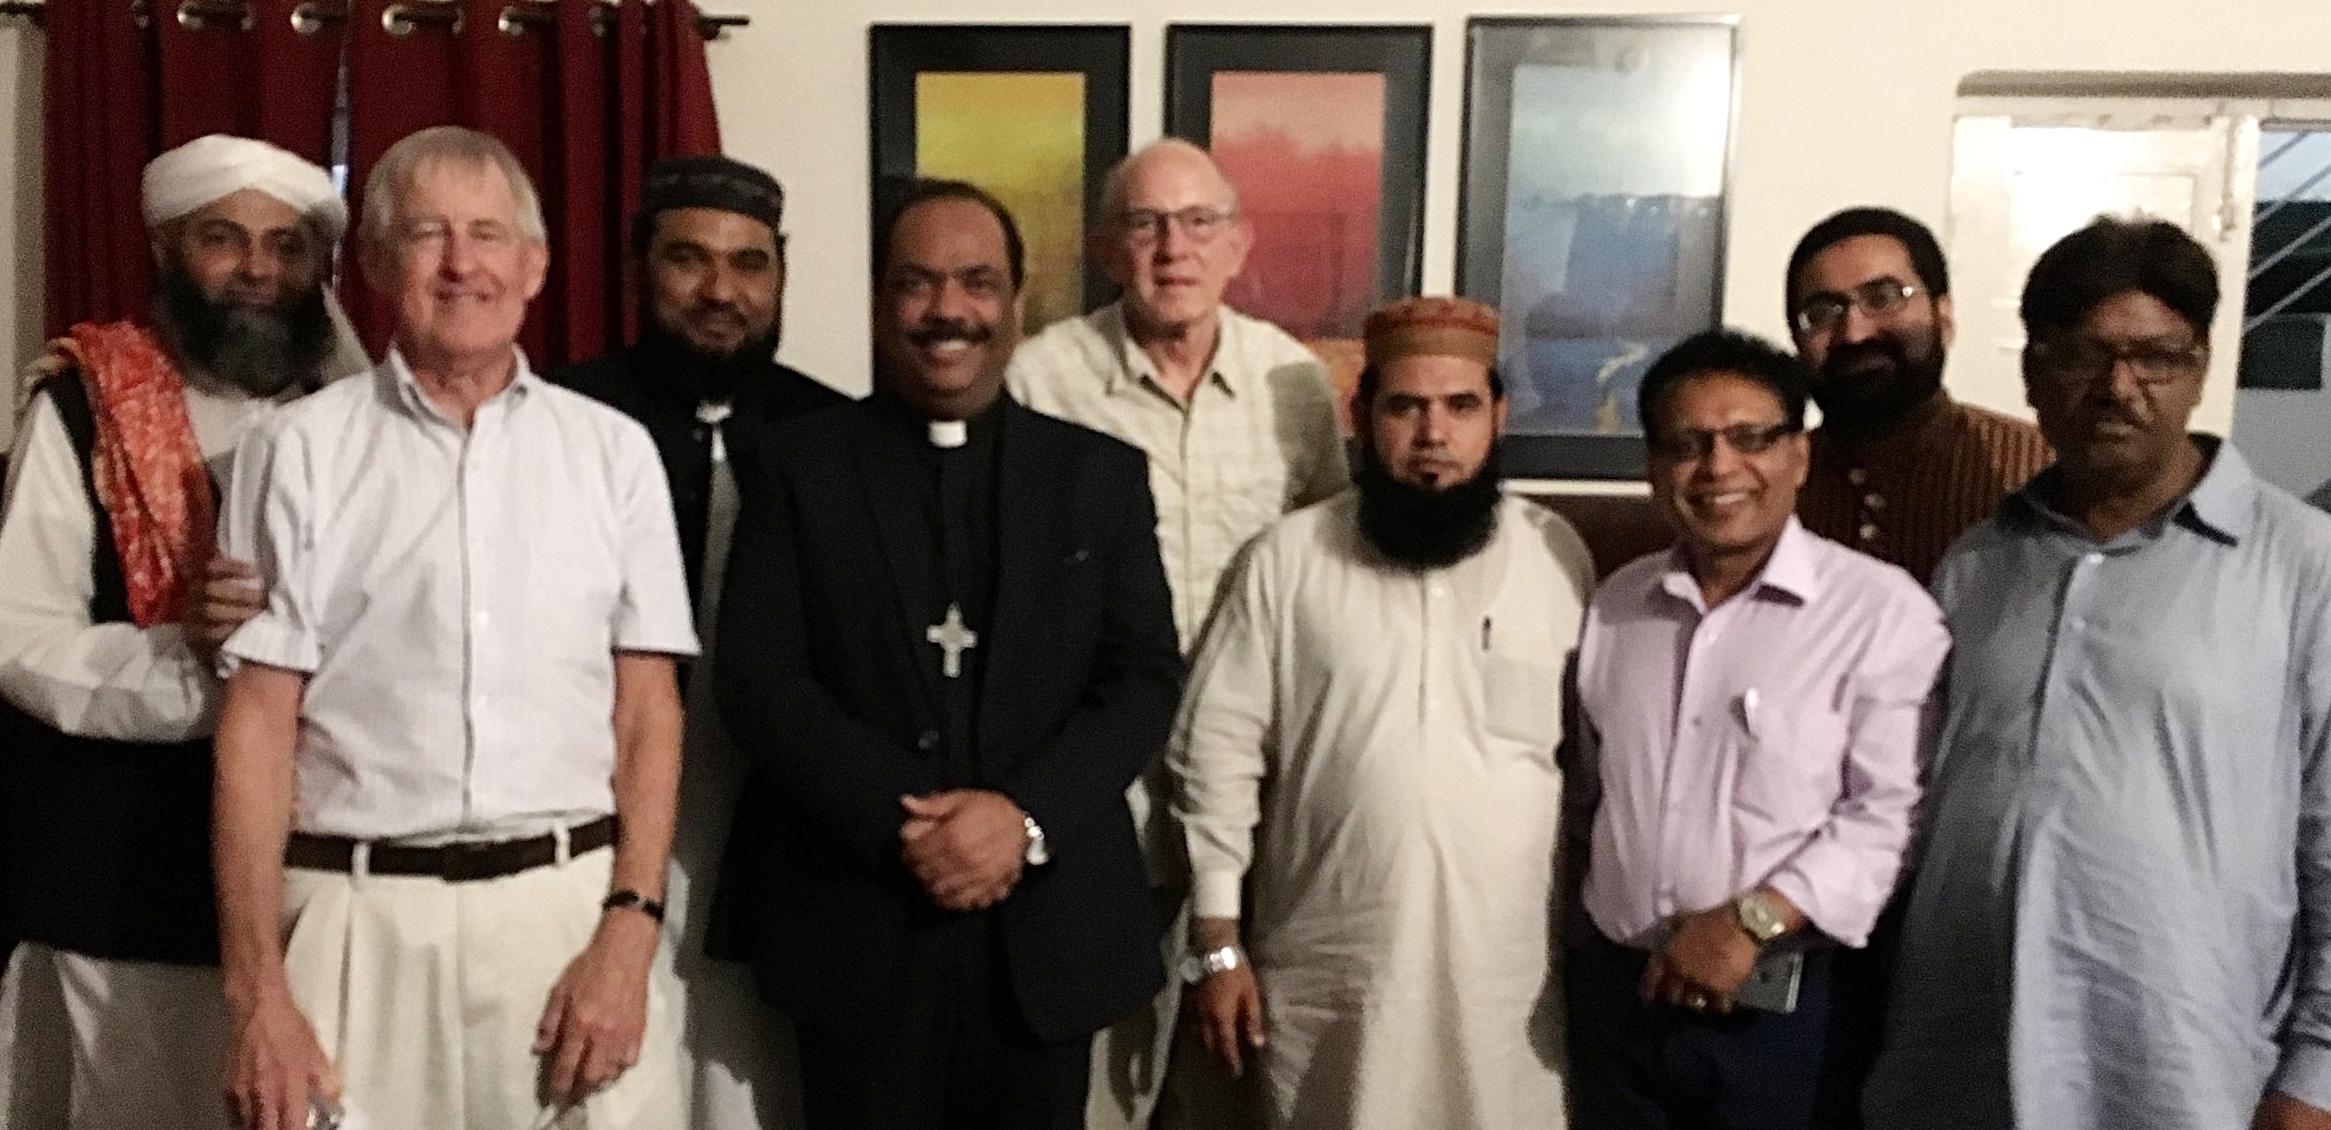 Interfaith dialogue hosted by Presbyterians